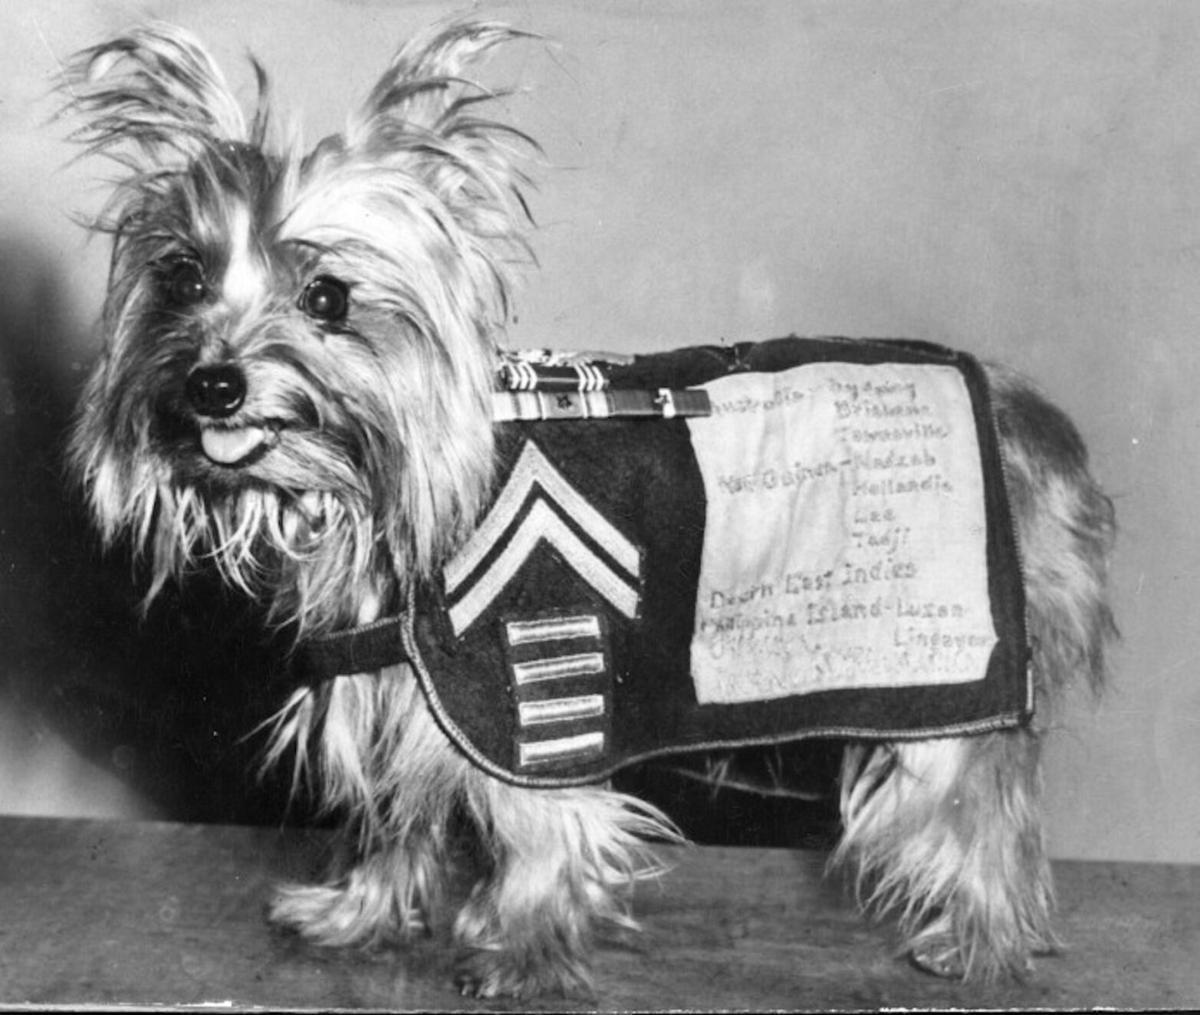 https://ilovemydogsomuch.com/wp-content/uploads/2021/08/Smoky-the-Dog_War-Veteran.jpg